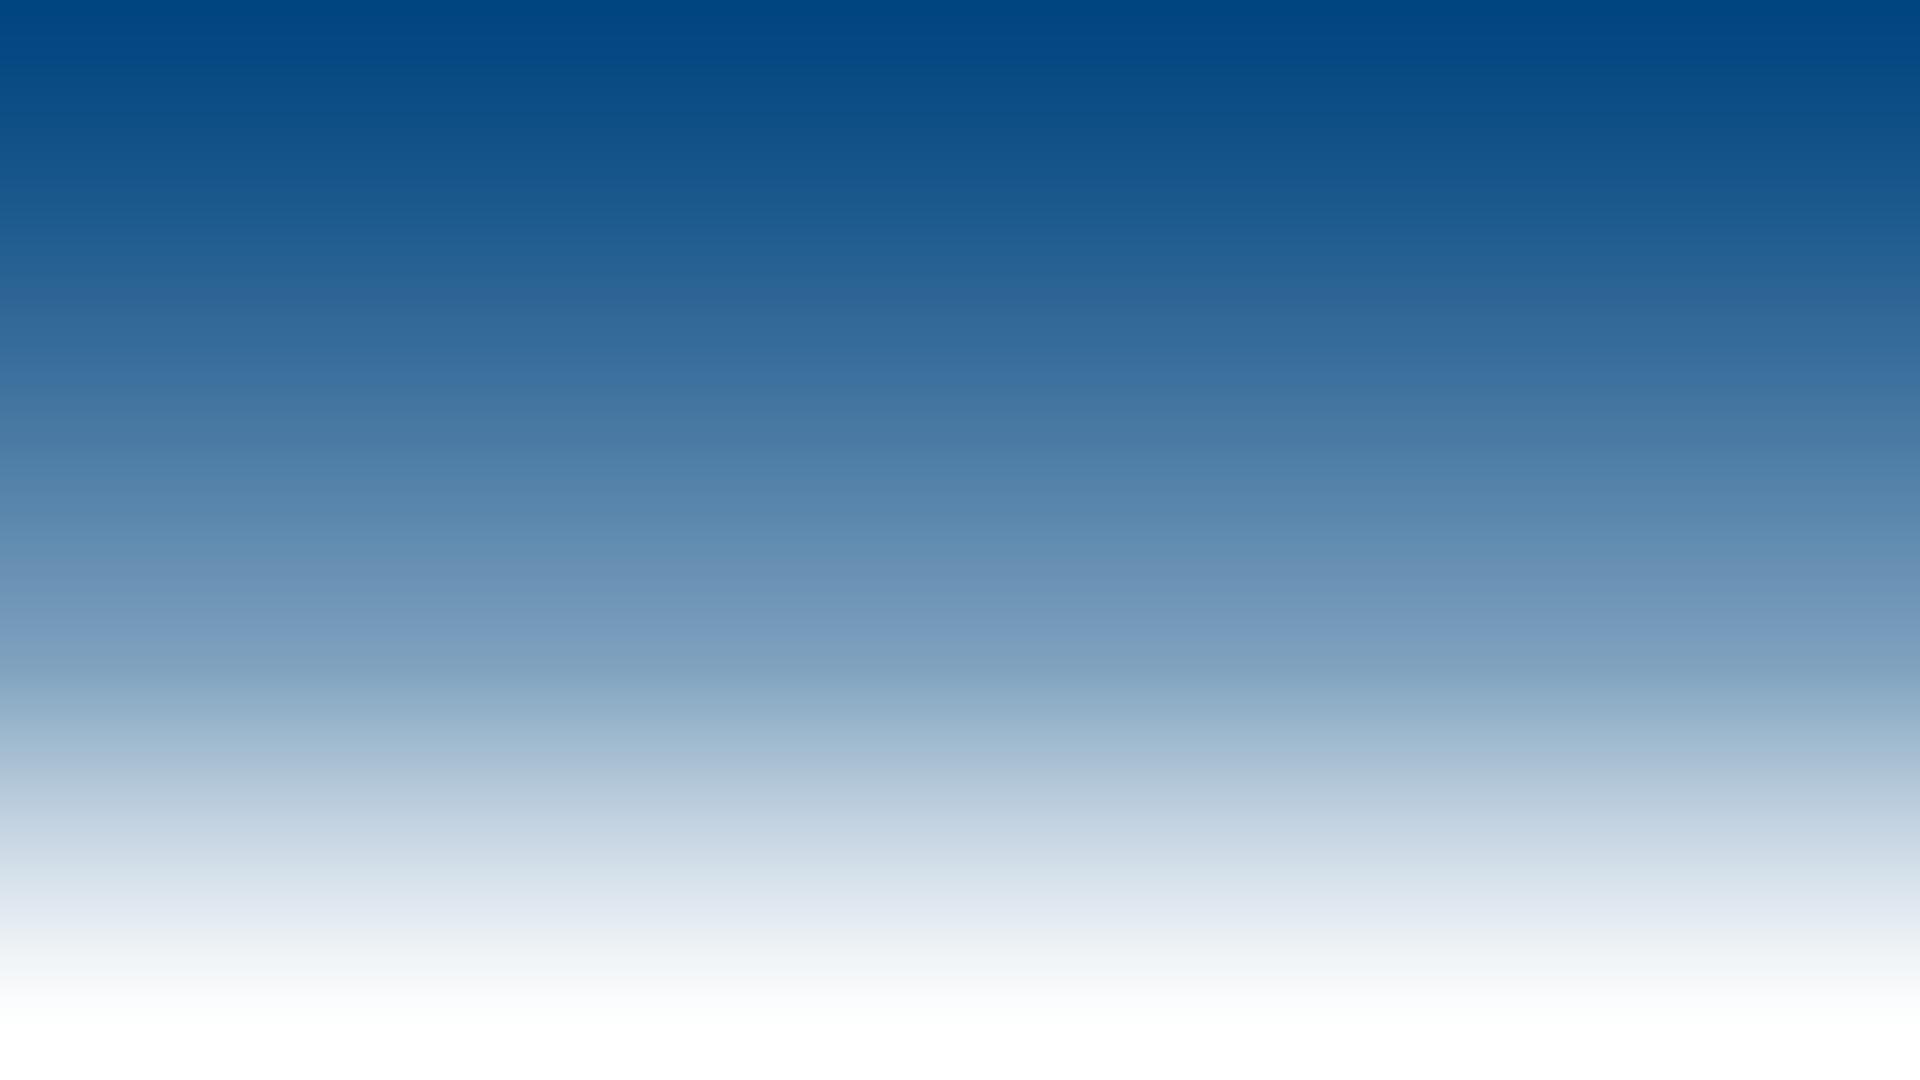 Dolphio technologies_sky